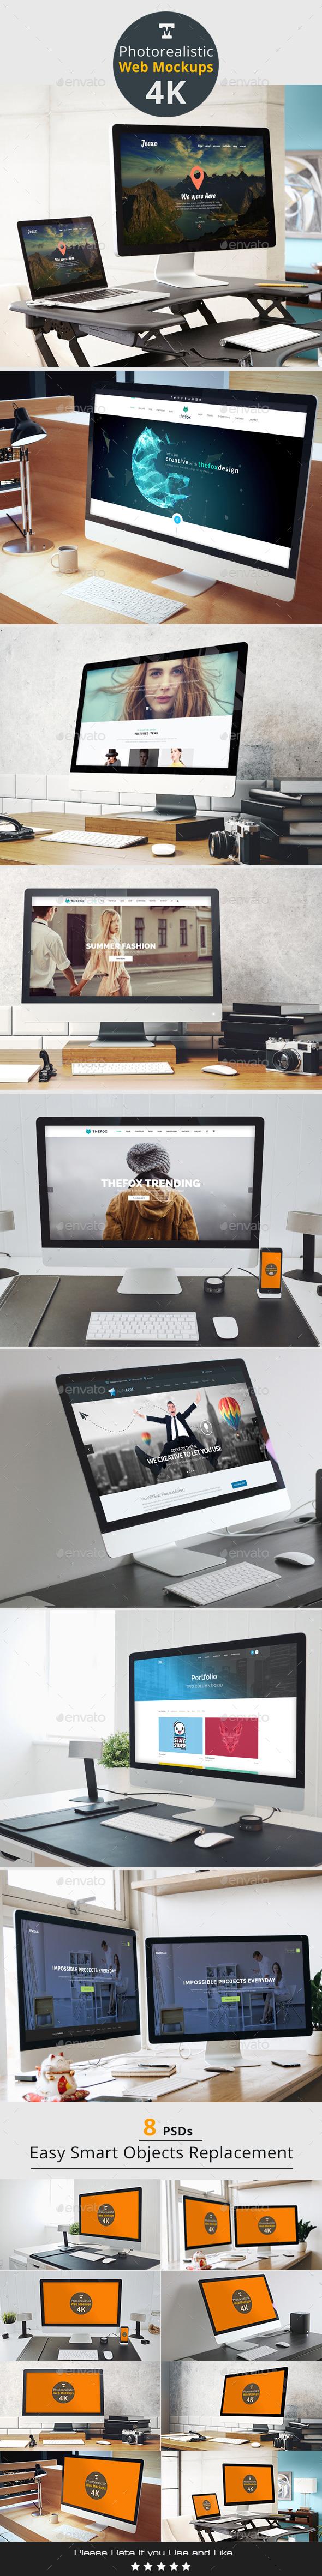 Photo-realistic Responsive Web Mockups 4K - Monitors Displays